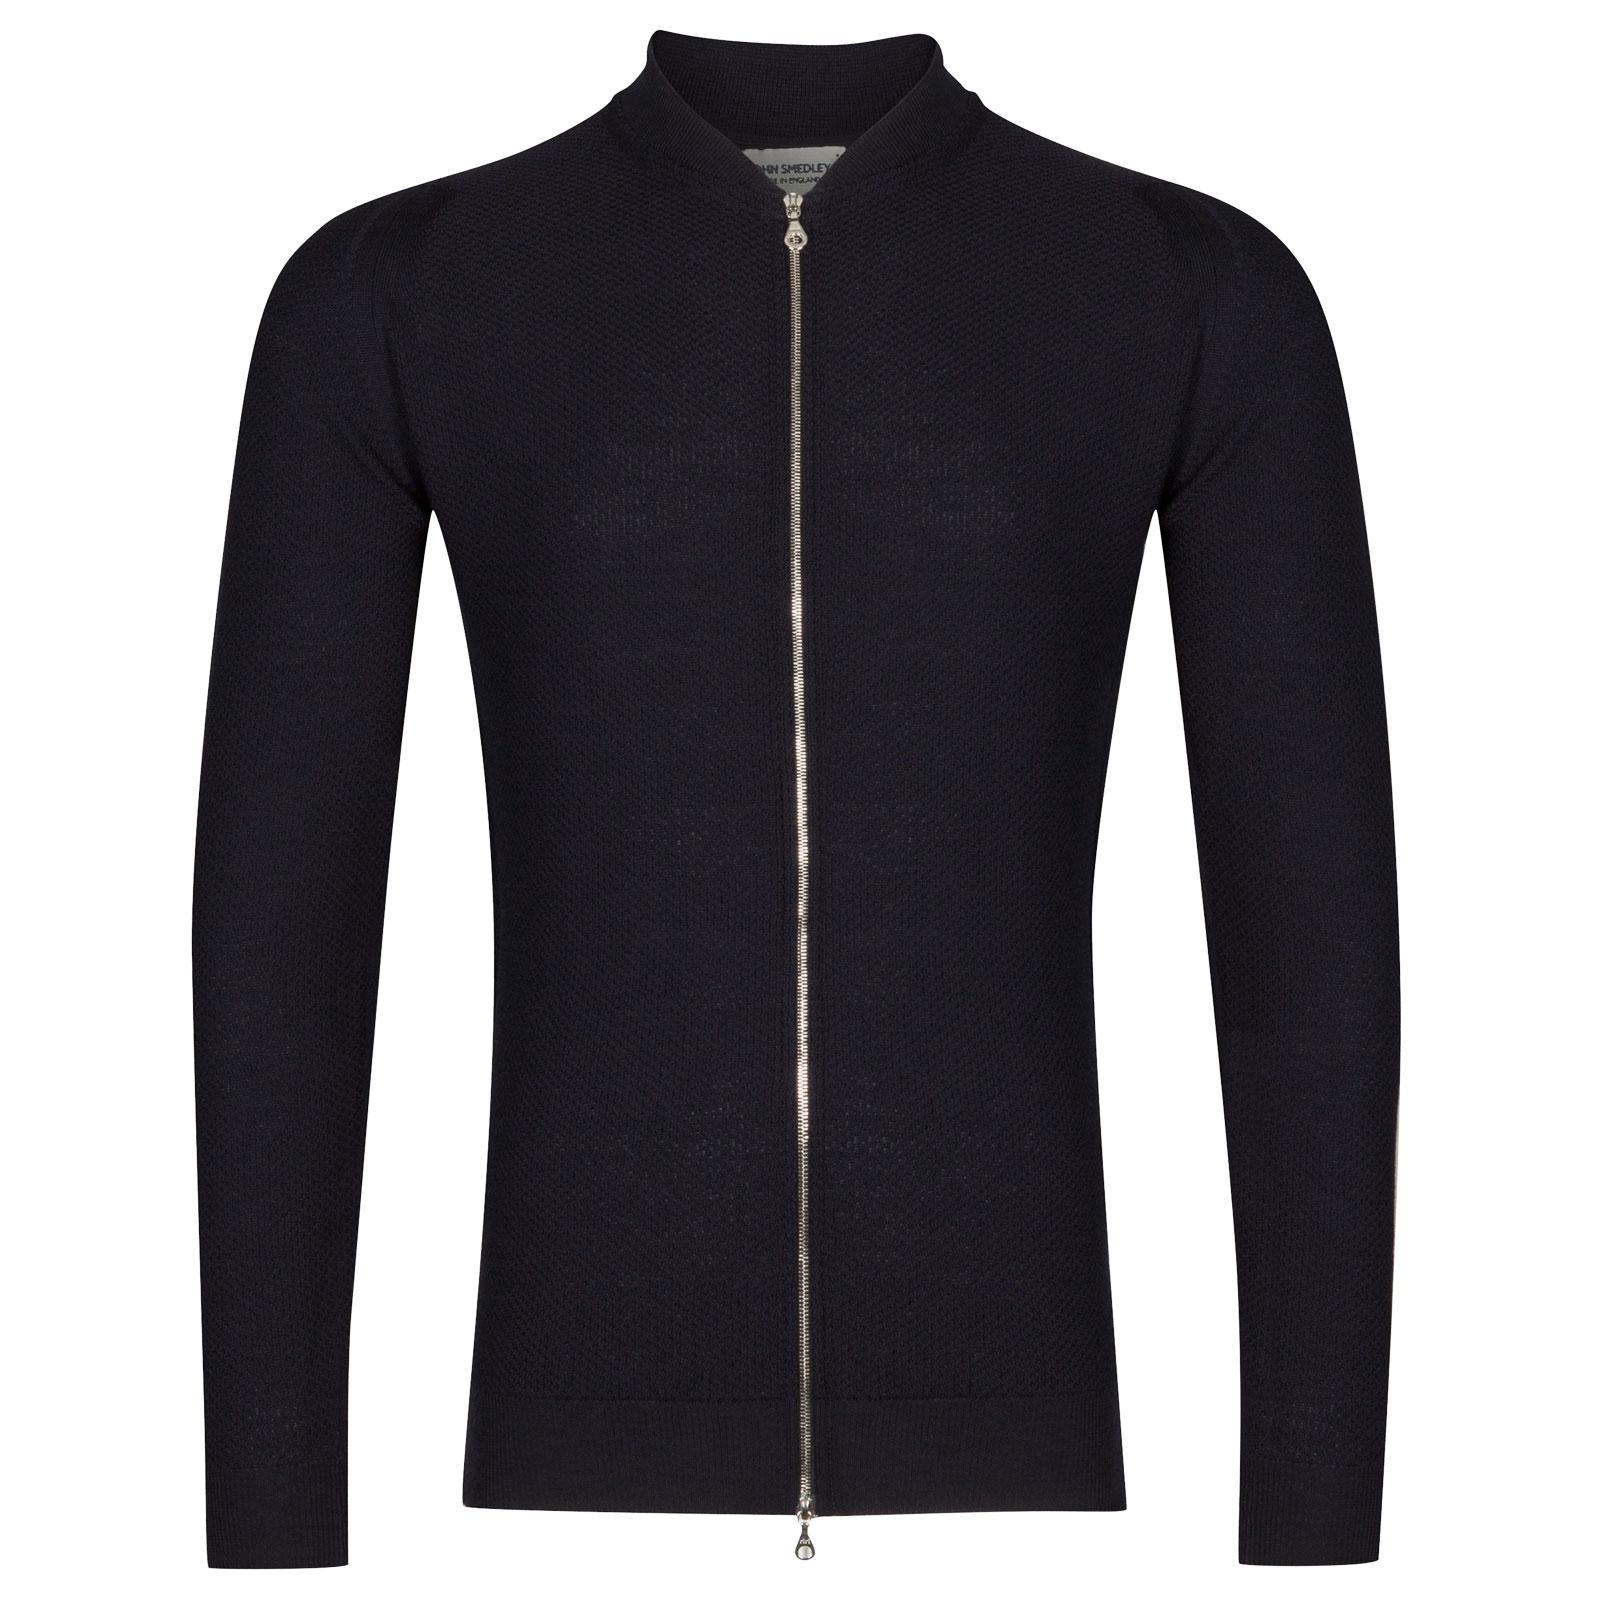 John Smedley 6Singular Merino Wool Jacket in Midnight-M